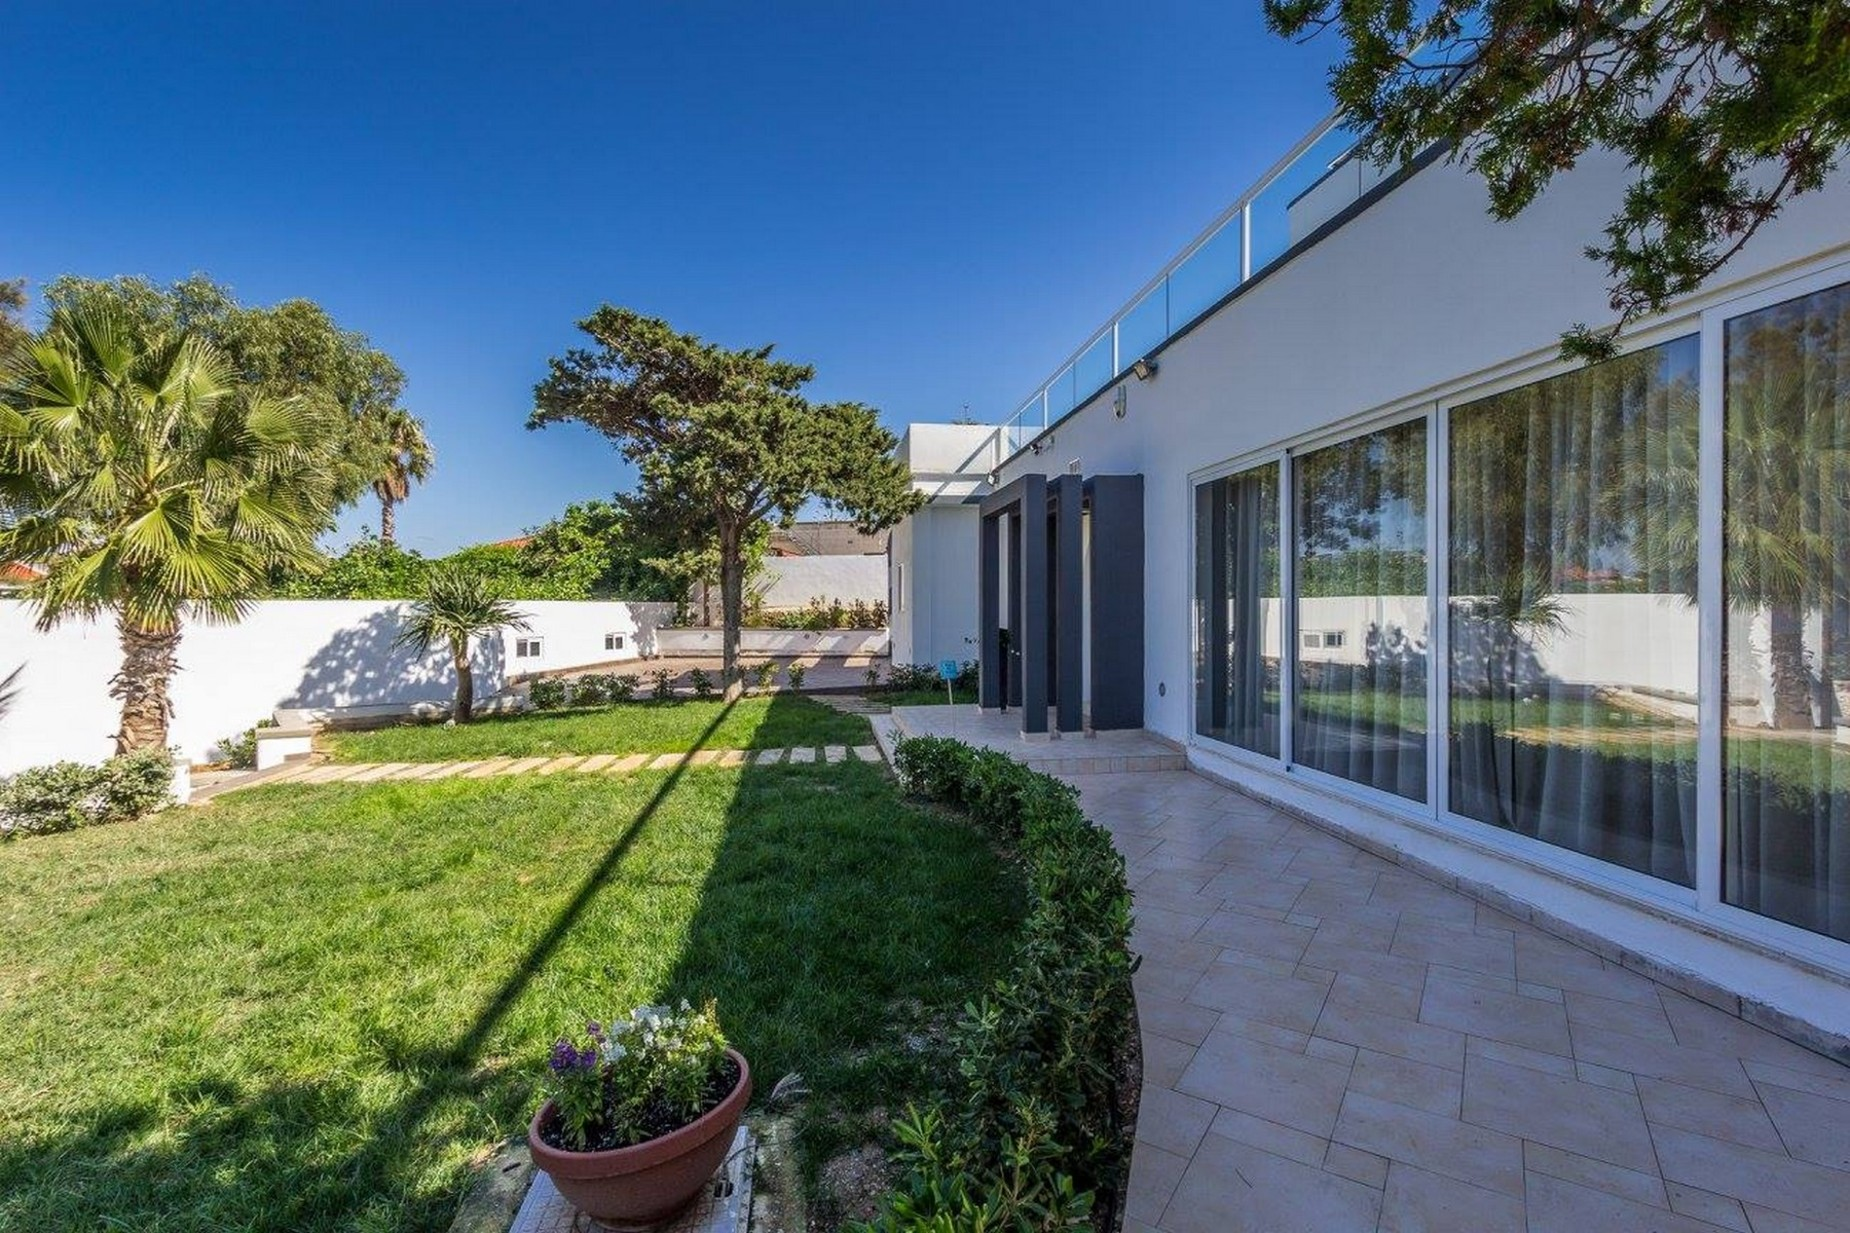 4 bed Villa For Rent in Mellieha, Mellieha - thumb 3